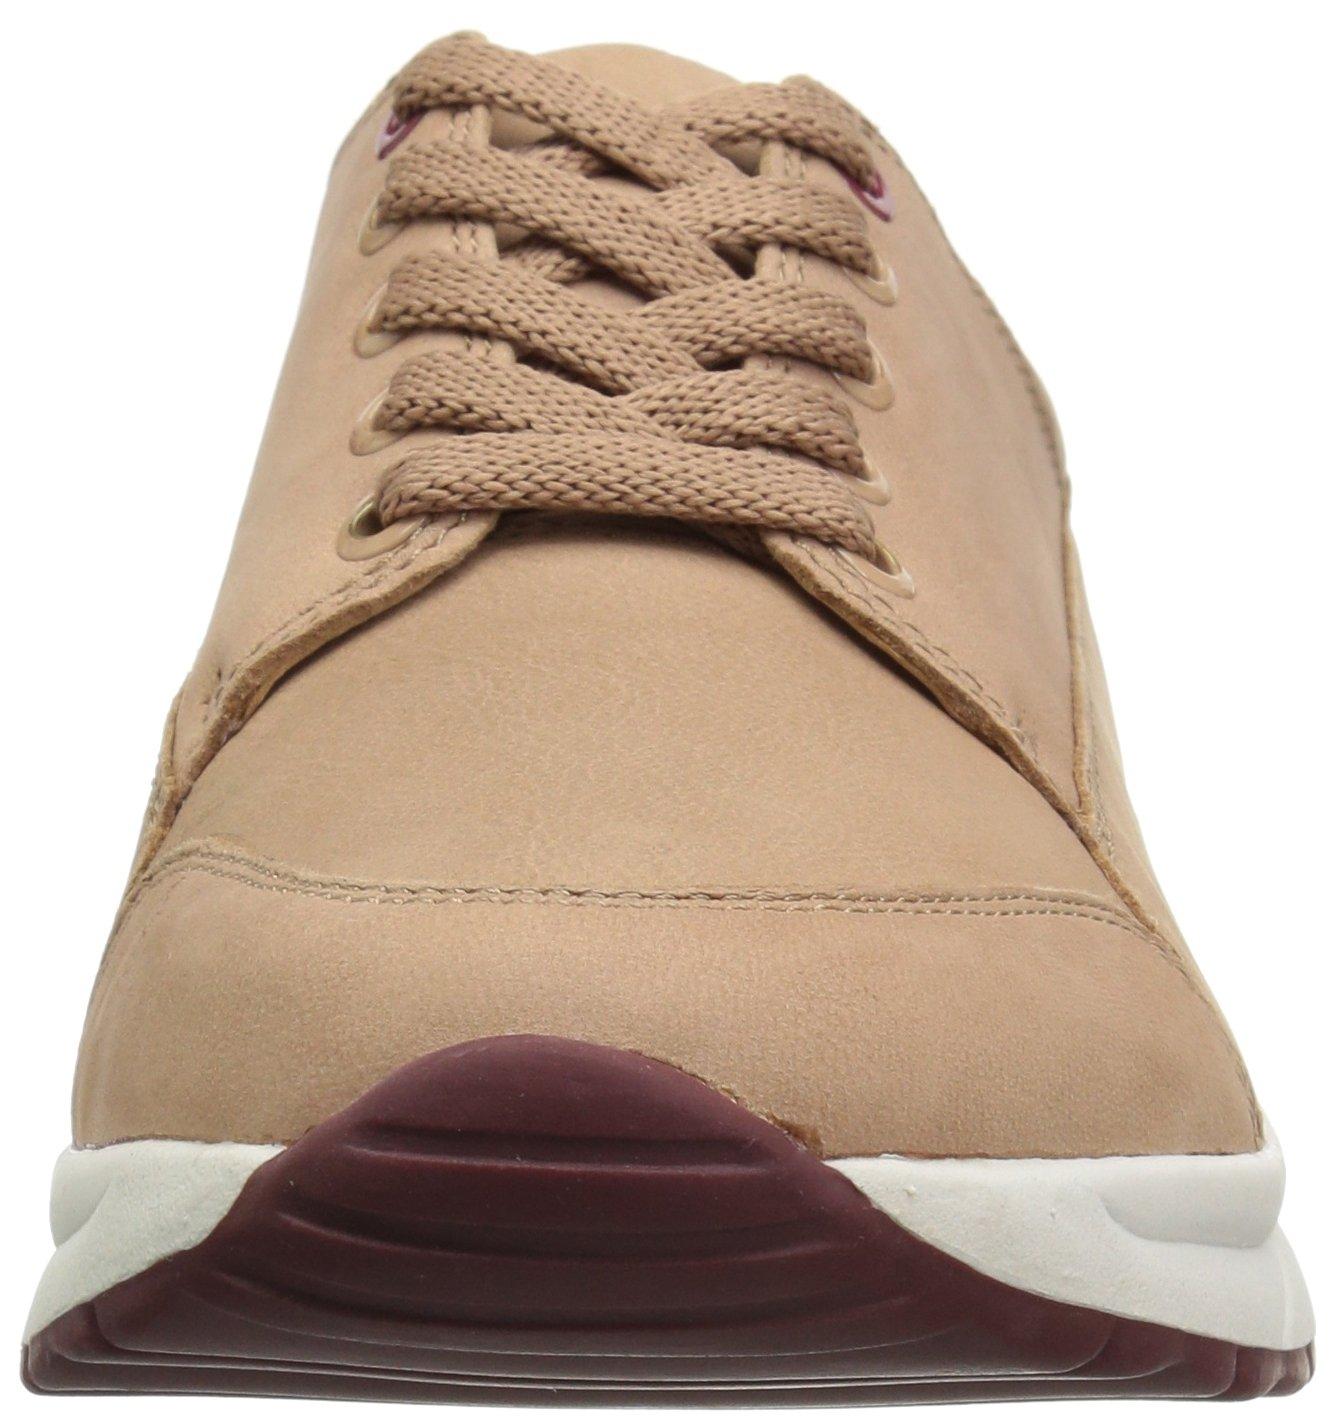 Naturalizer Women's Sabine Sneaker B075739J9Y 9.5 W US|Gingersnap